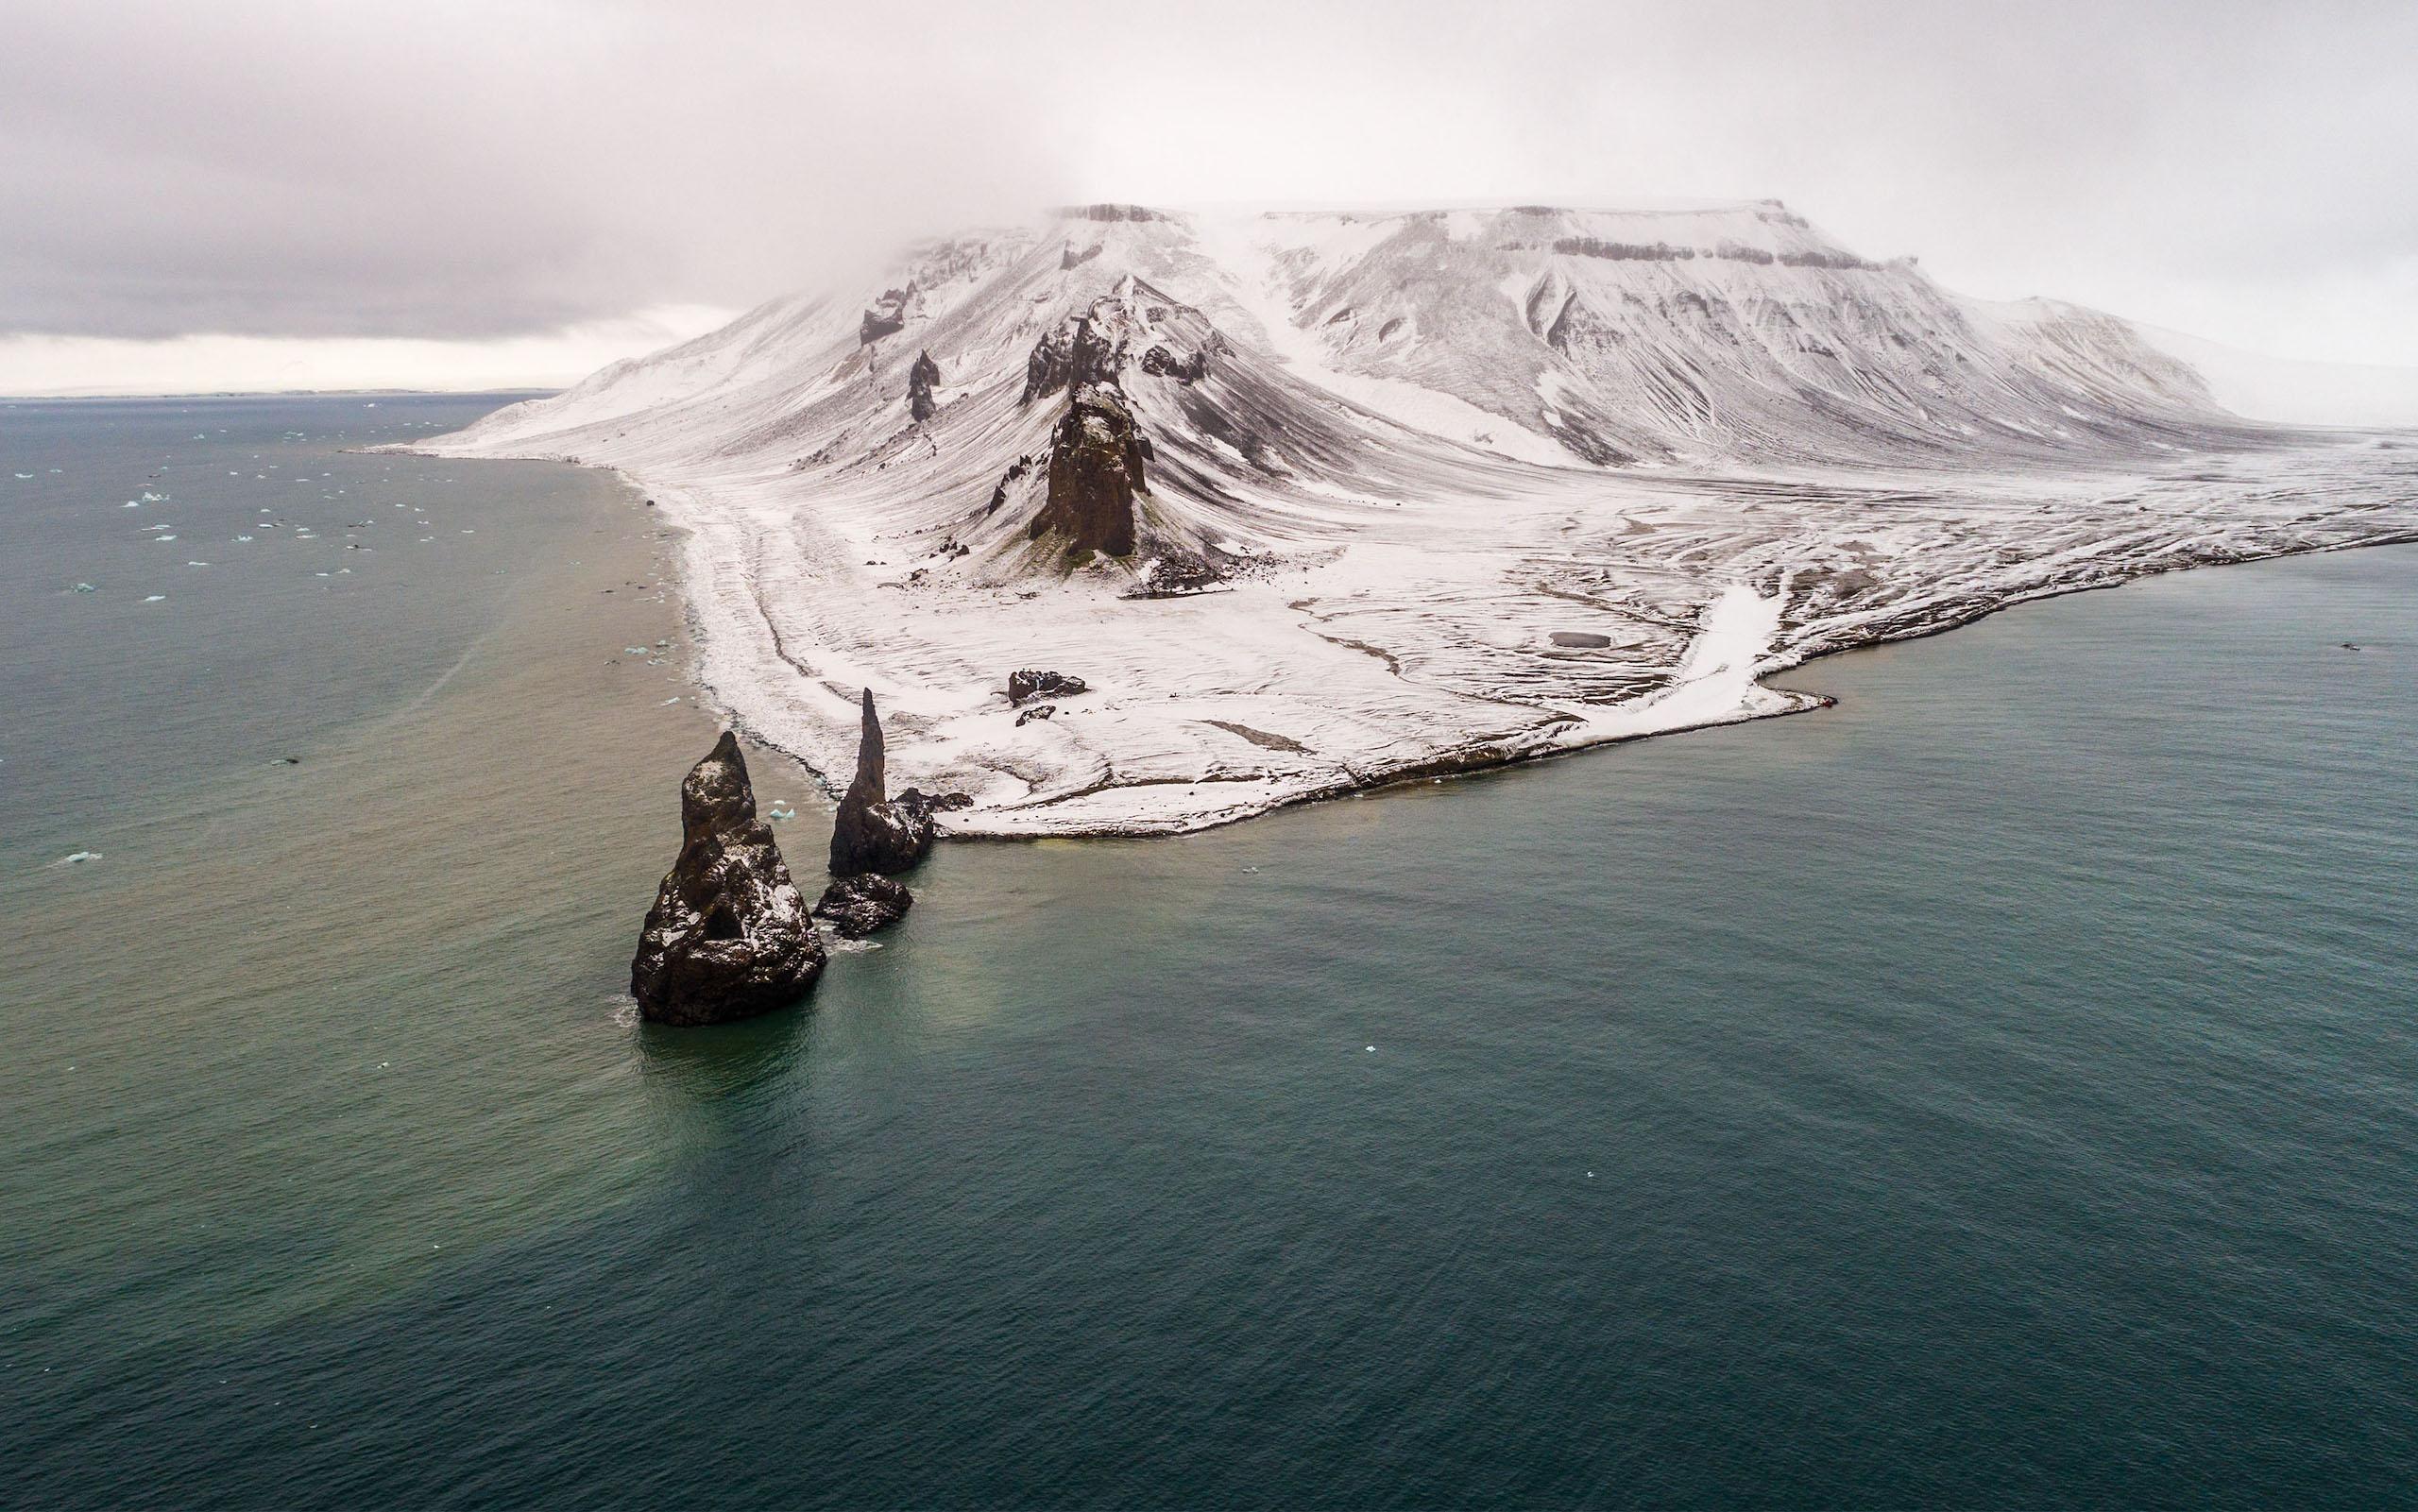 russische Arktis-westlich (Weißes Meer, Franz-Joseph-Land, Nowaja Semlja, Sewernaja Semlja)